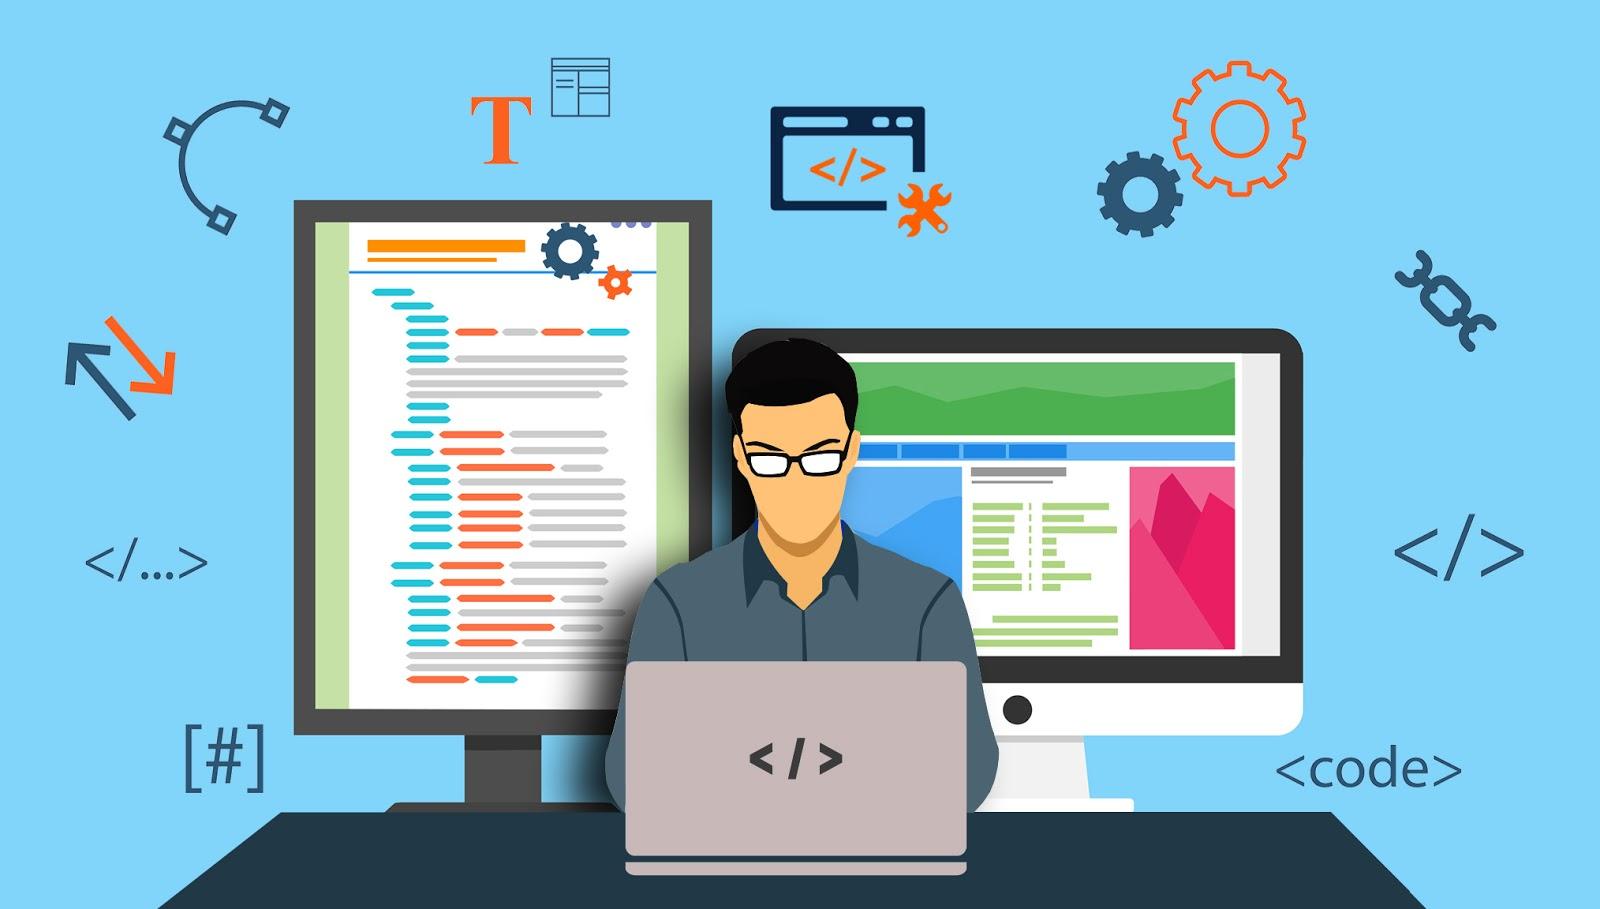 Short Term Computer Courses for Job | CodeKul Blog